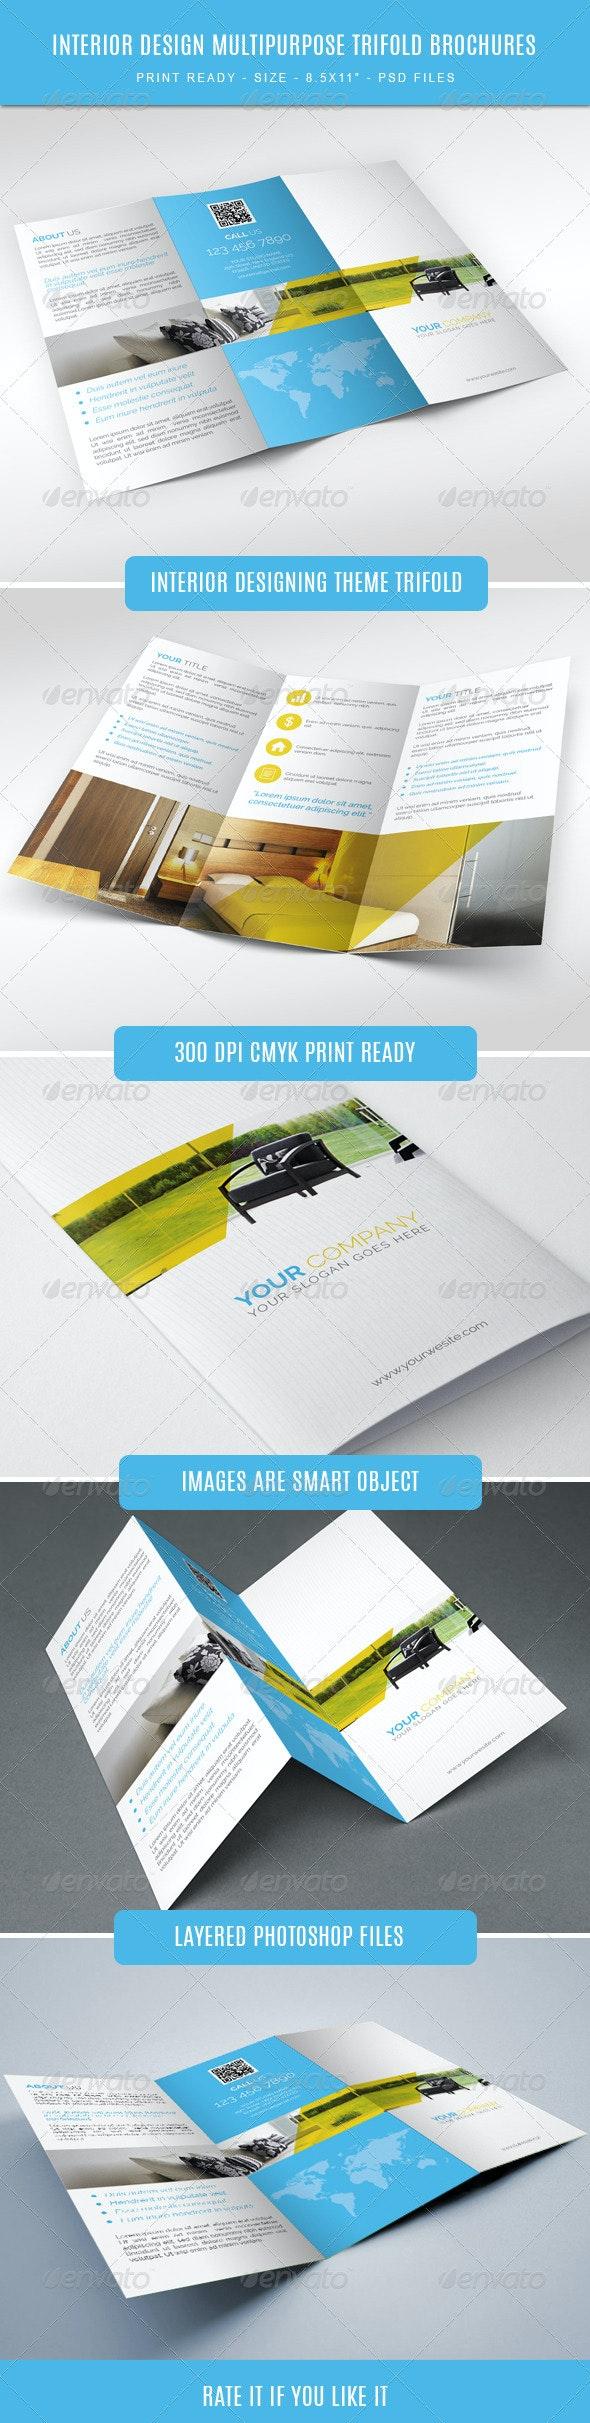 Interior Designing Tri-Fold Brochure - Informational Brochures